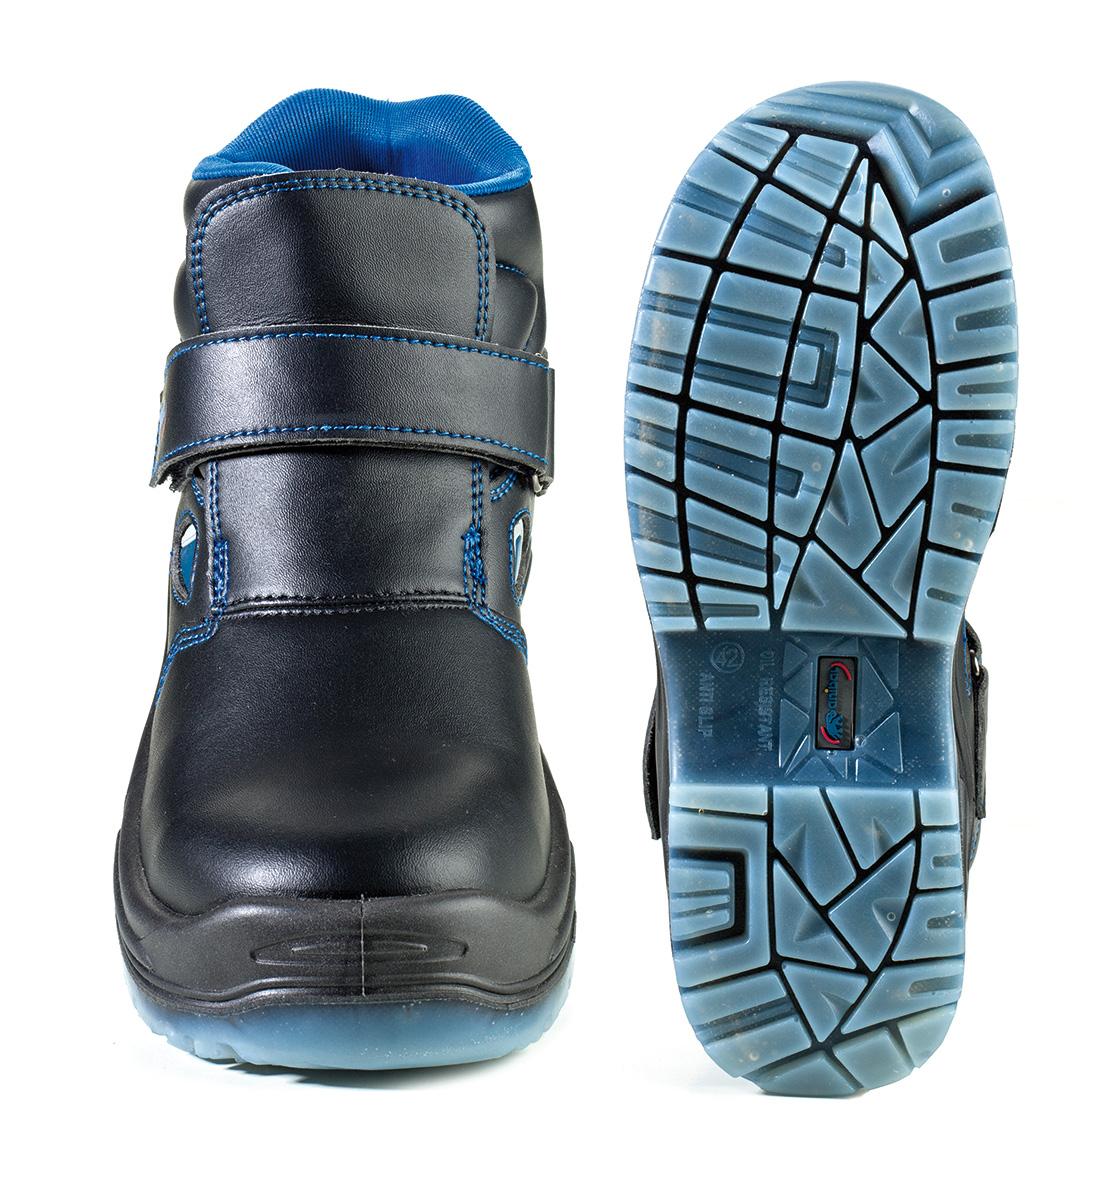 "1688-BSOAC Calzado de Seguridad Serie Confort Bota mod. ""AUGUSTO"". Bota ·  1688-BSOGNR. anibal 35758920f11"